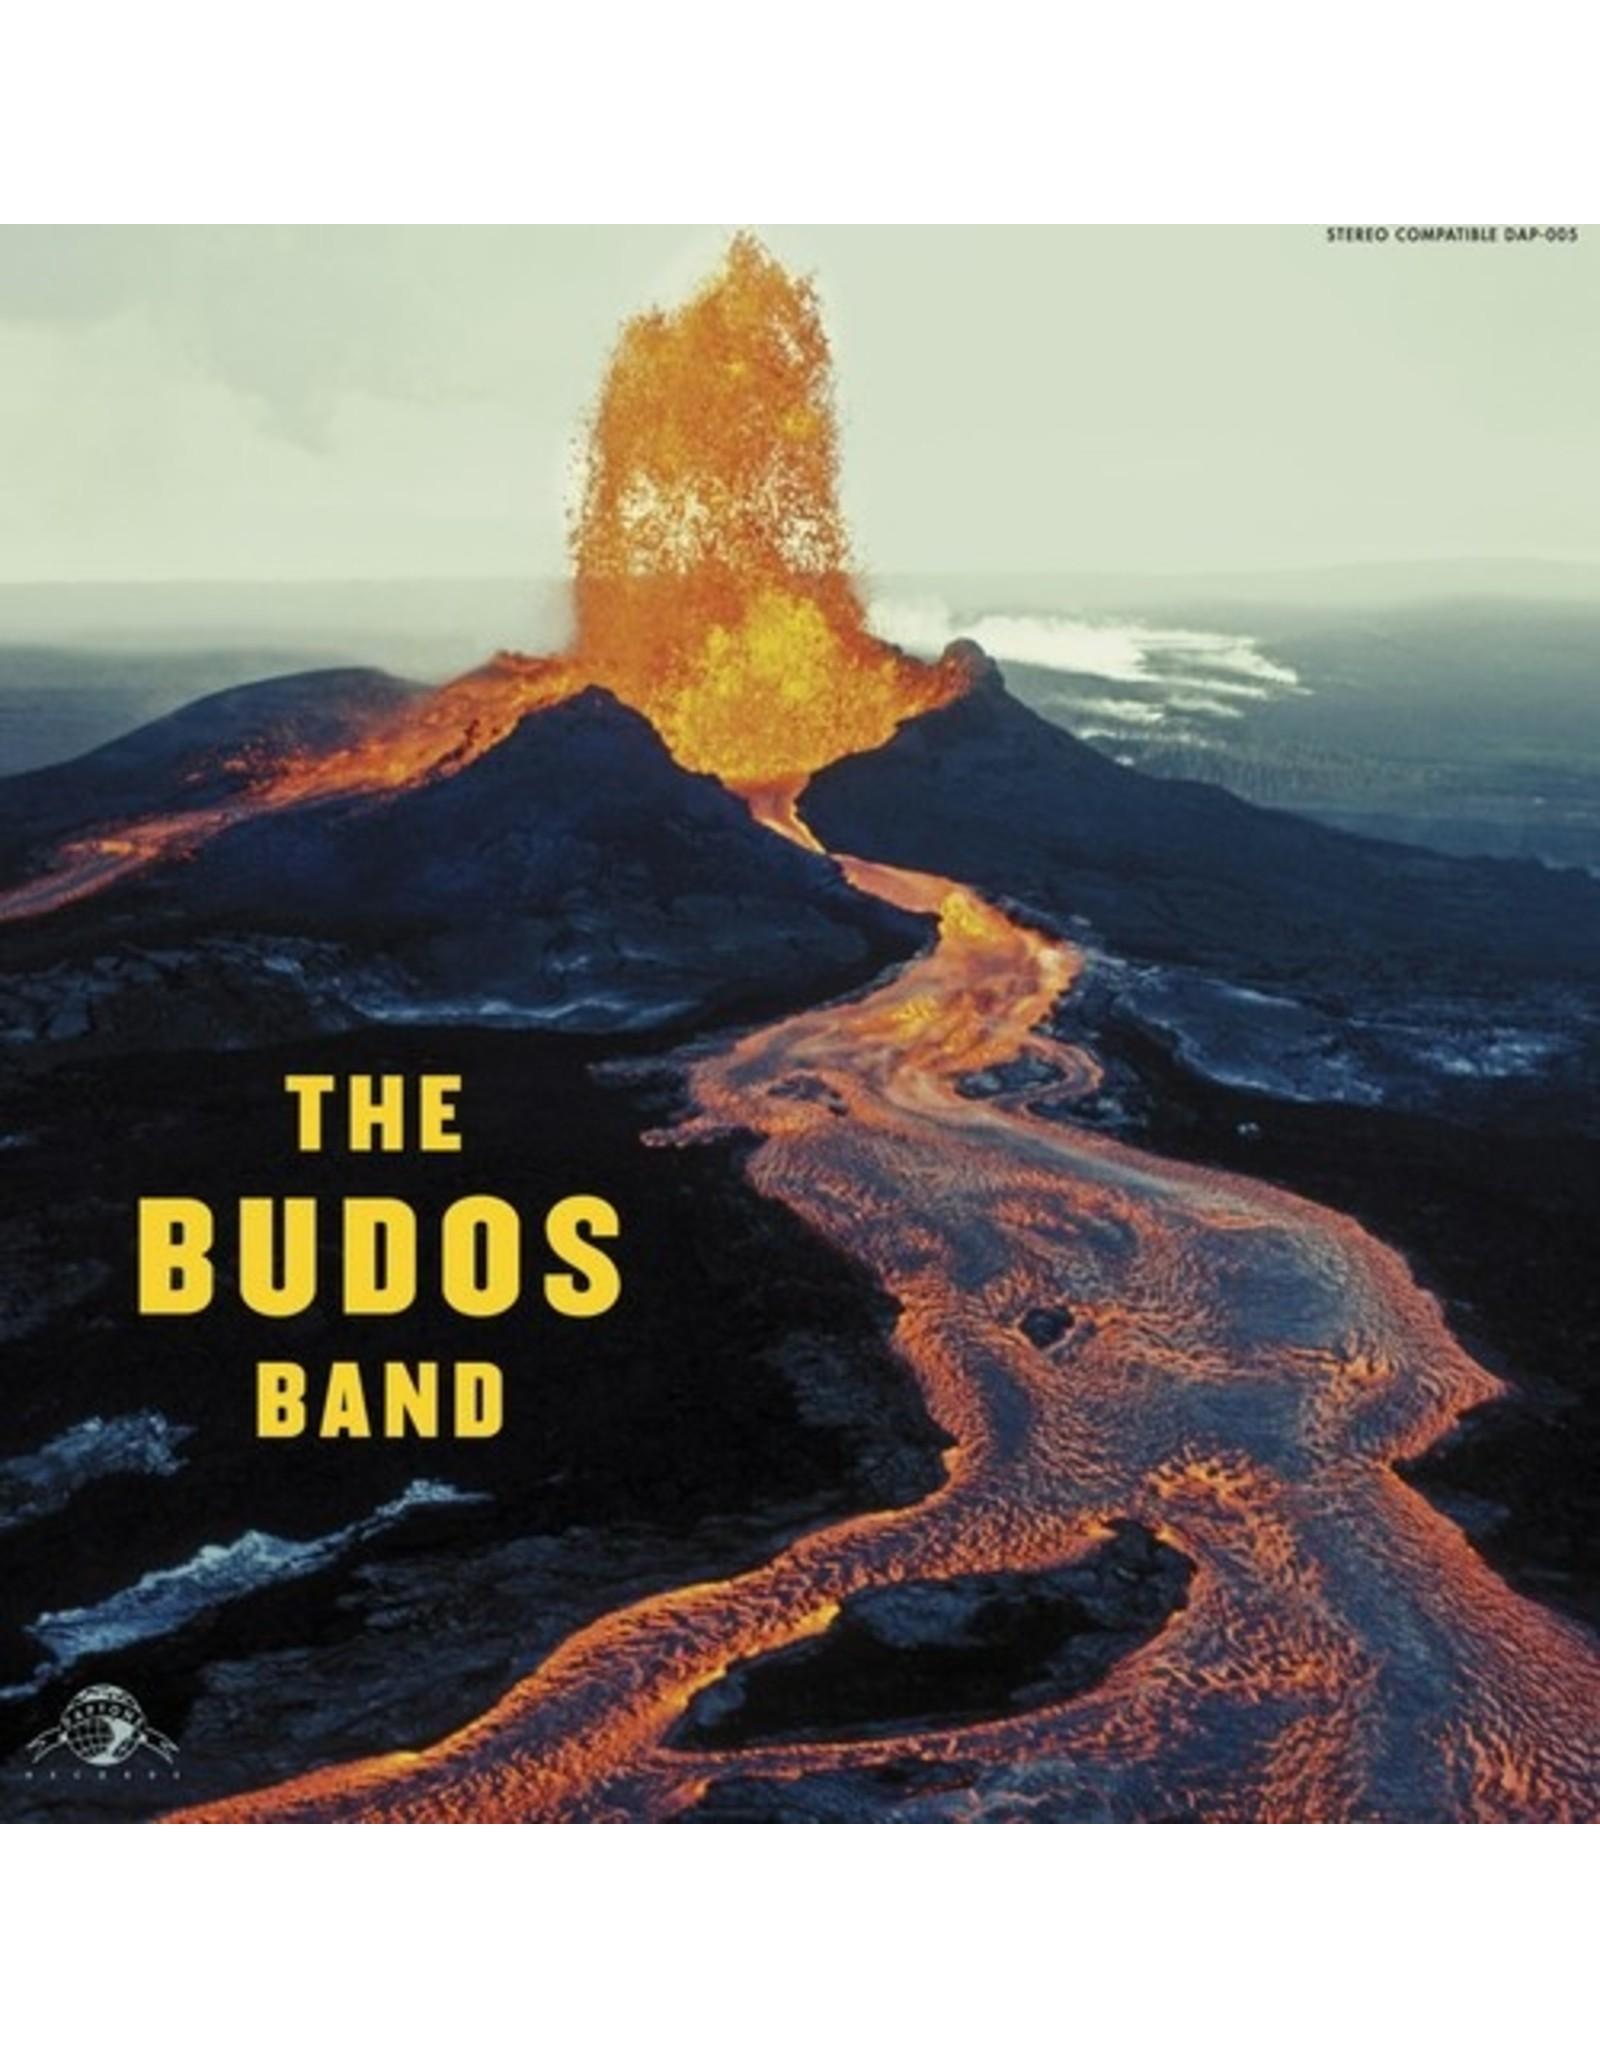 New Vinyl The Budos Band - The Budos Band I LP